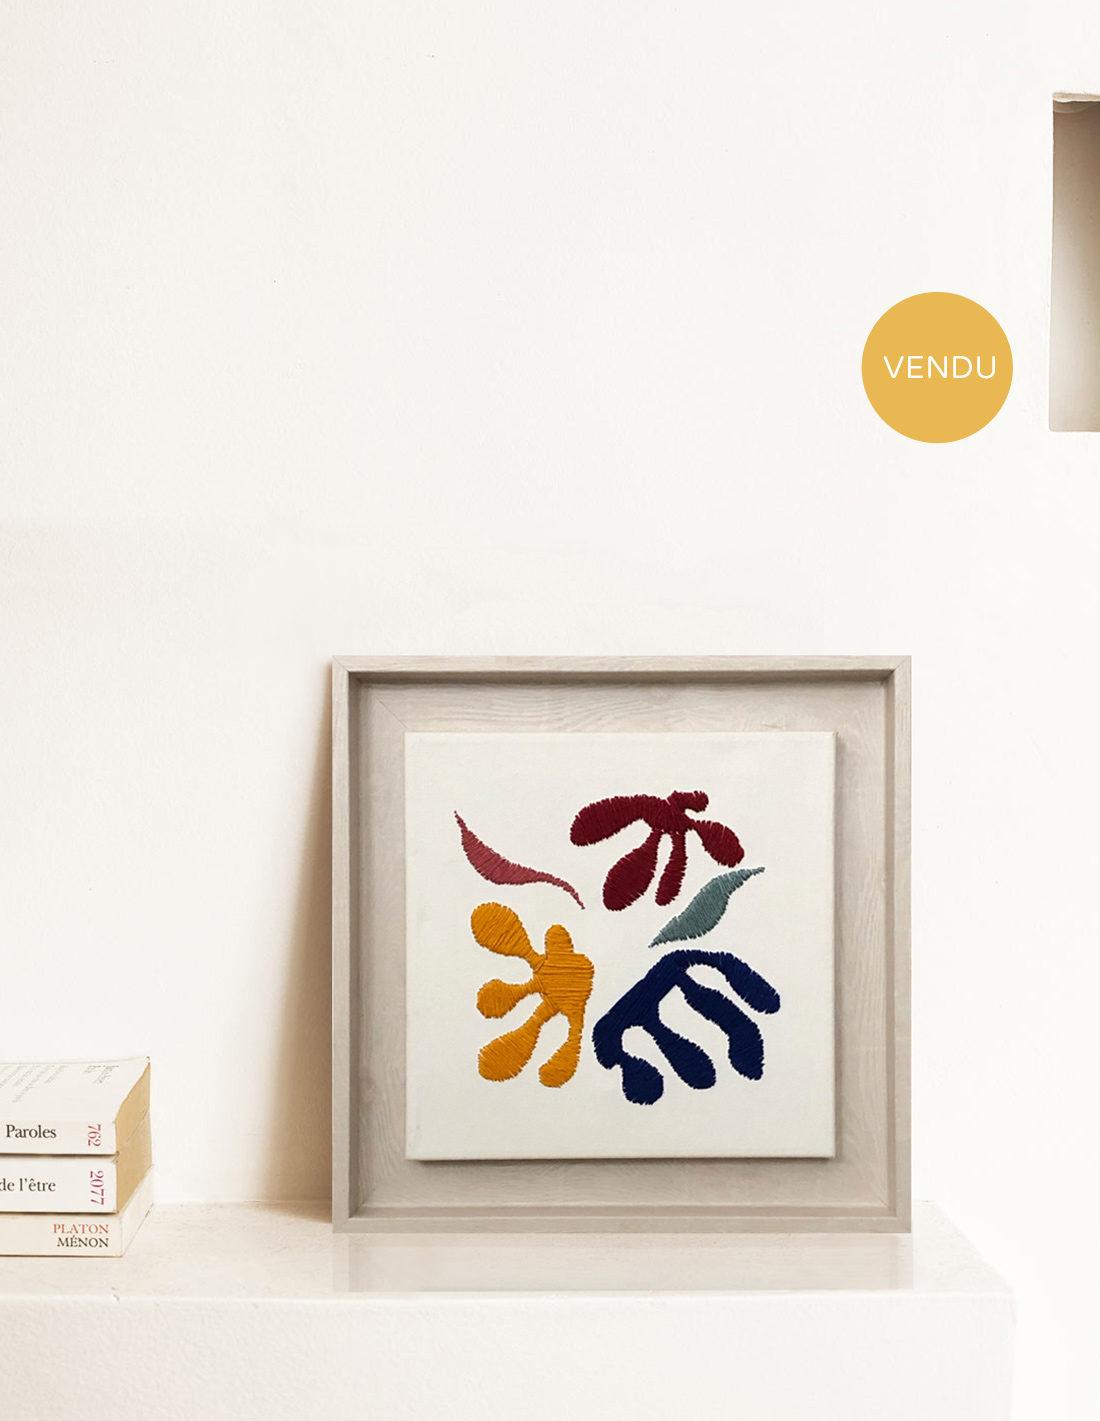 Kanica - Tableau - Hommage à Matisse